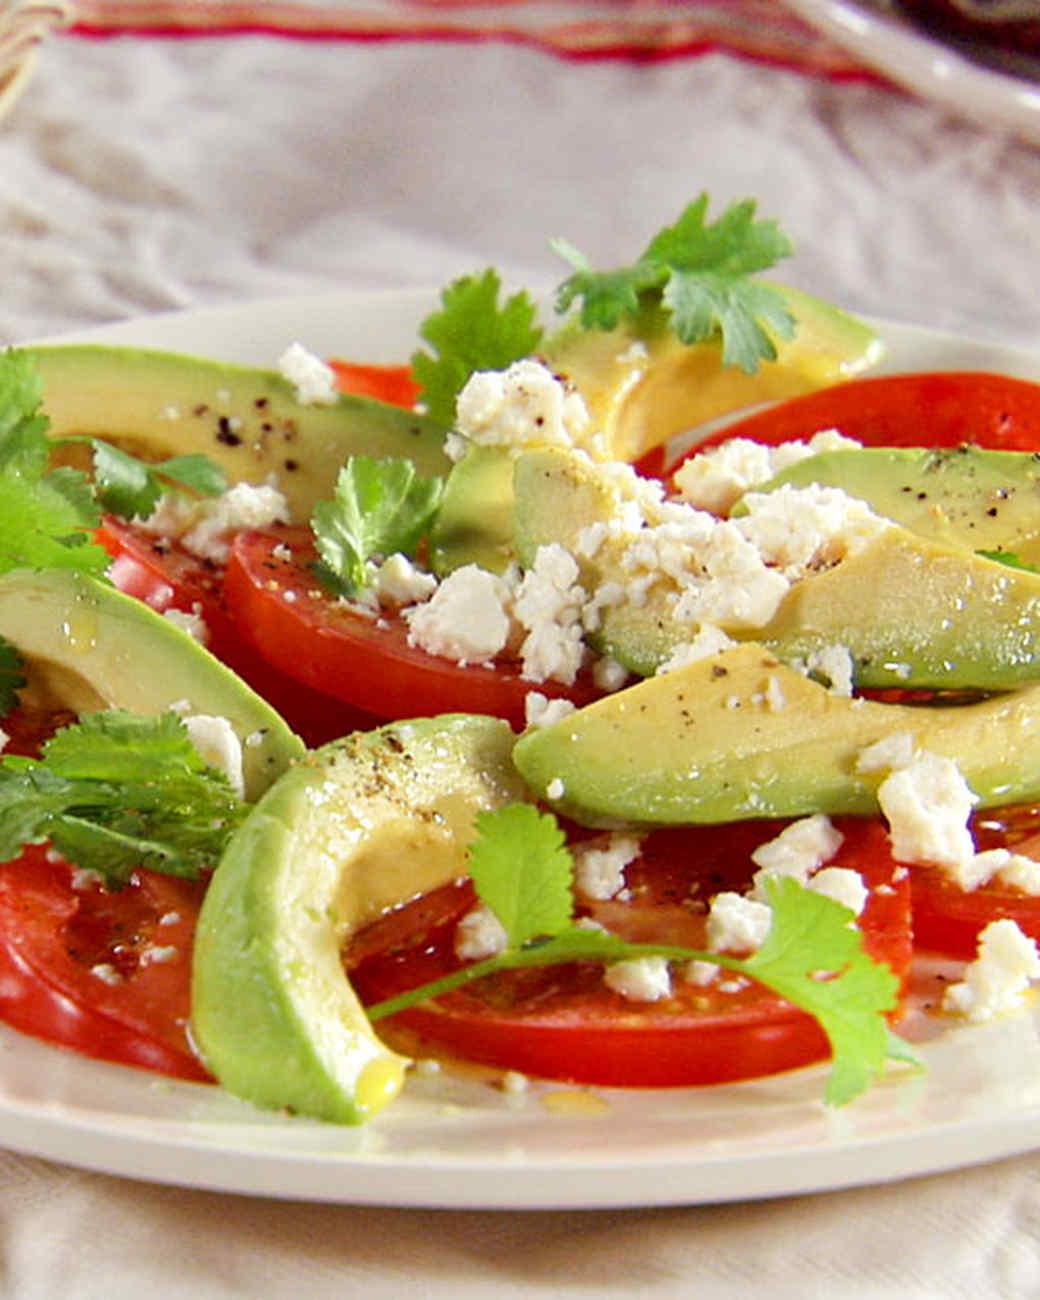 mh_1073_mexican_tomato_salad.jpg